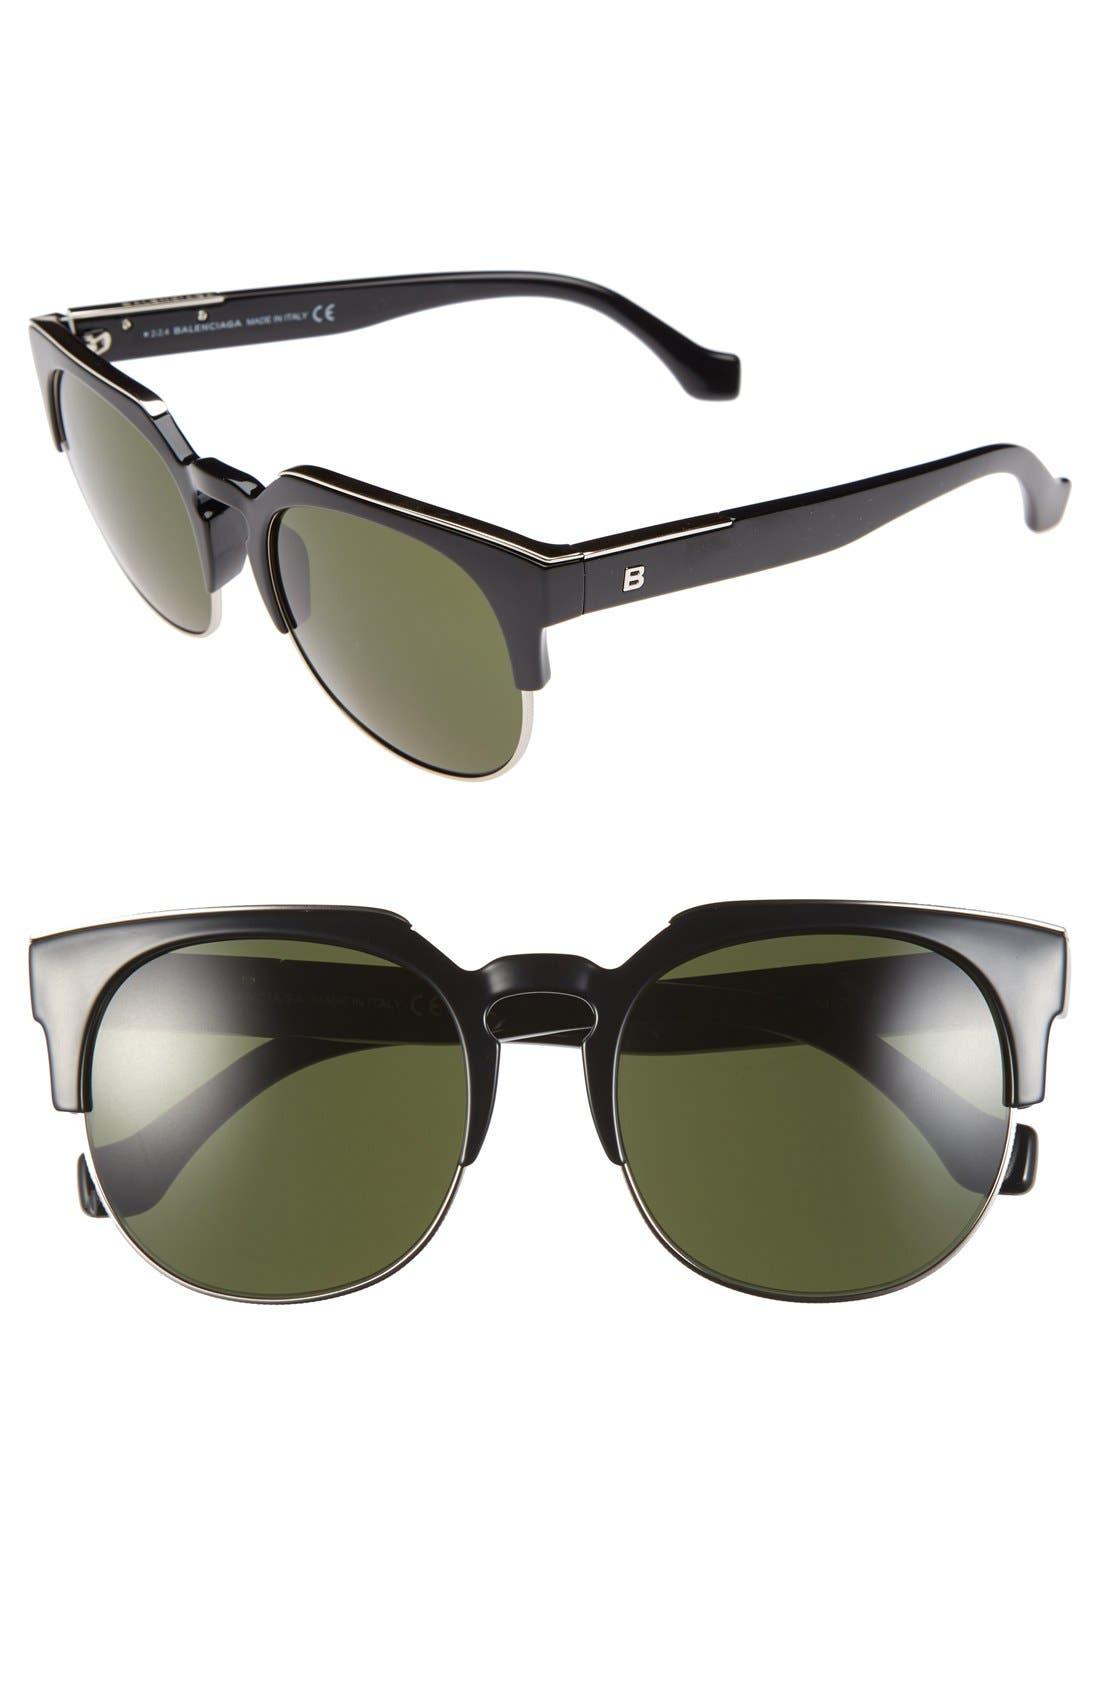 Alternate Image 1 Selected - Balenciaga Paris 54mm Sunglasses